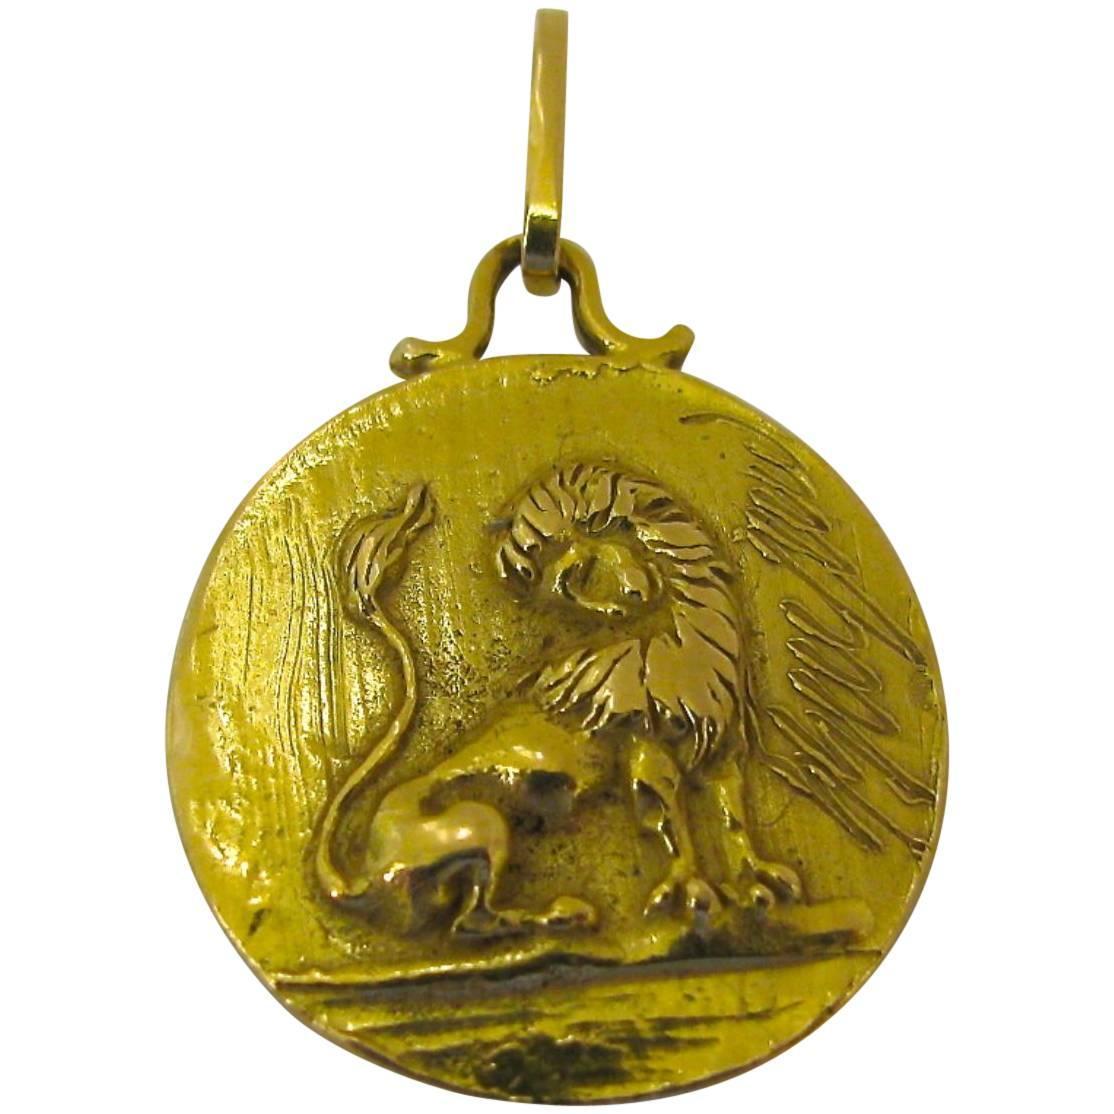 Nino D Antonio Germano Zodiac Pendant At 1stdibs